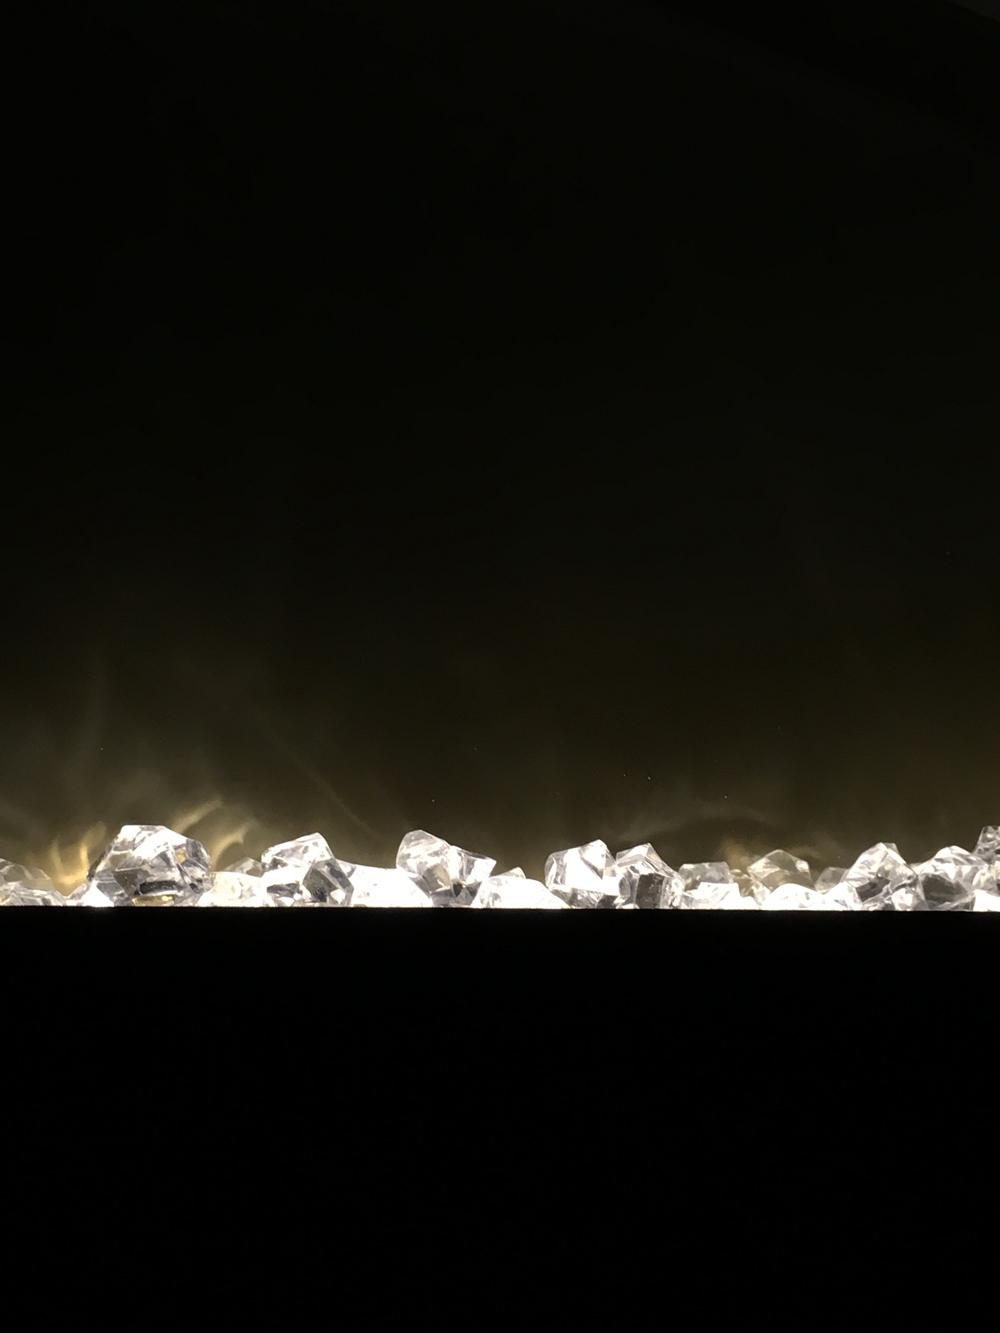 EF-WM363-crystals-21000-x-1333-300-DPI